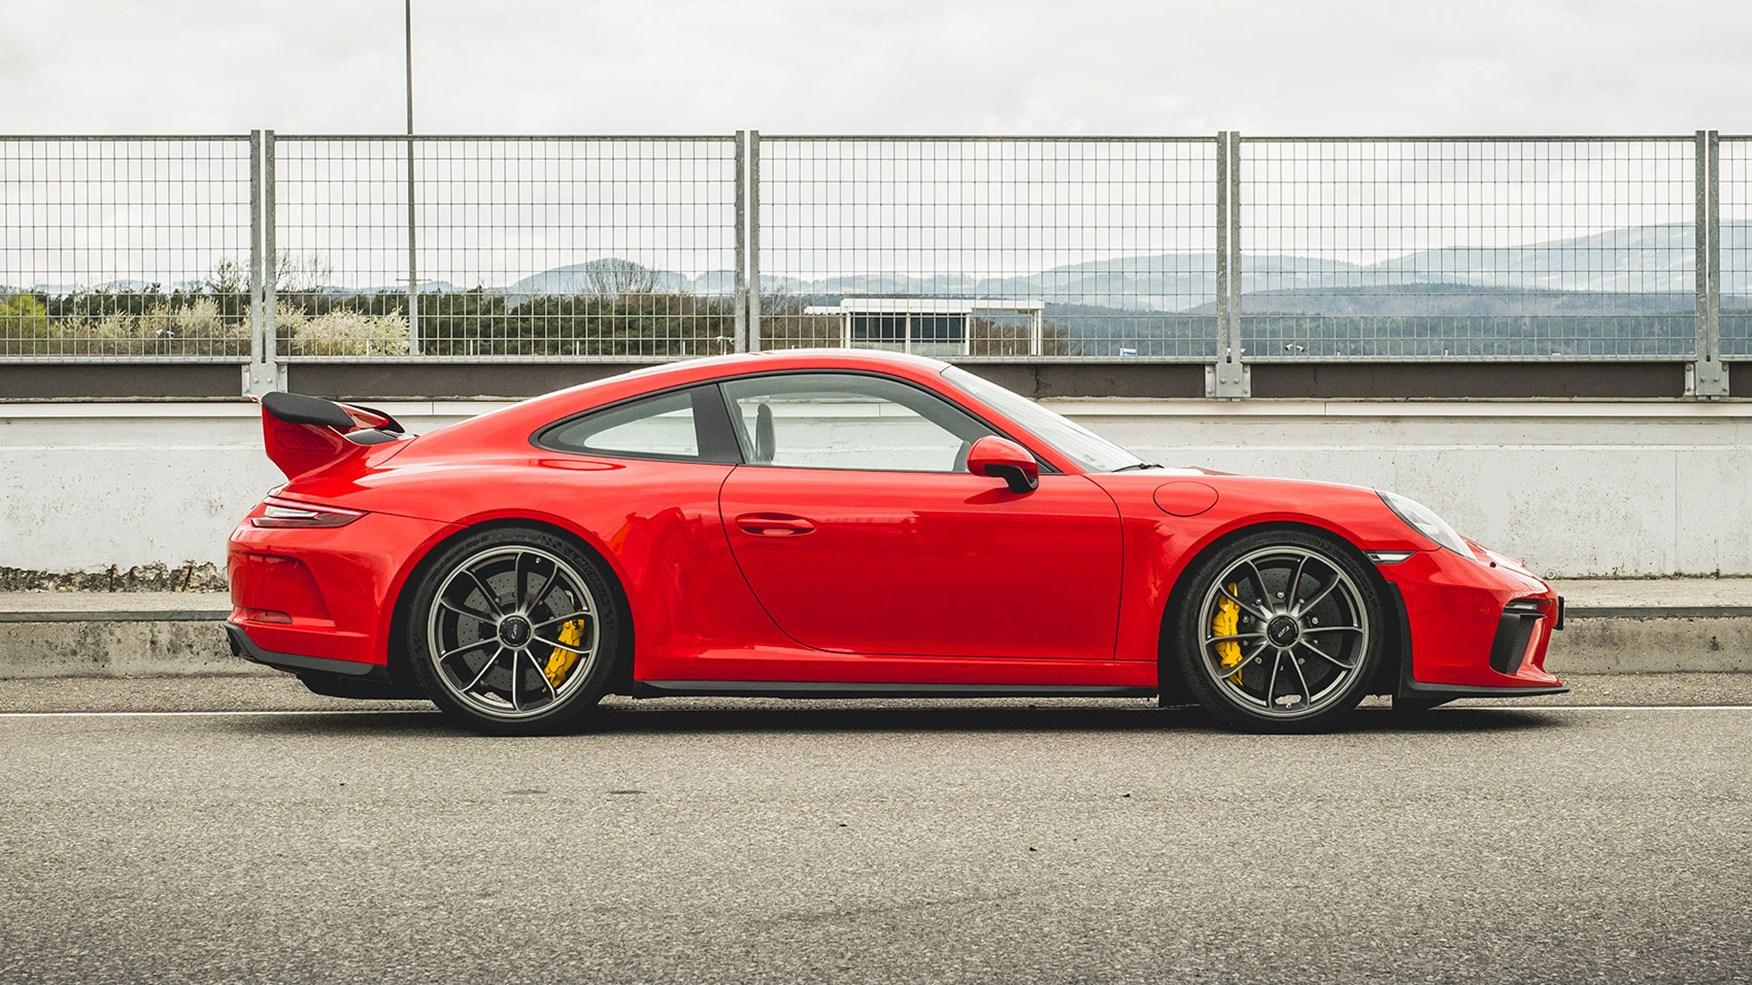 Porsche 911 Gt3 2017 Review By Car Magazine